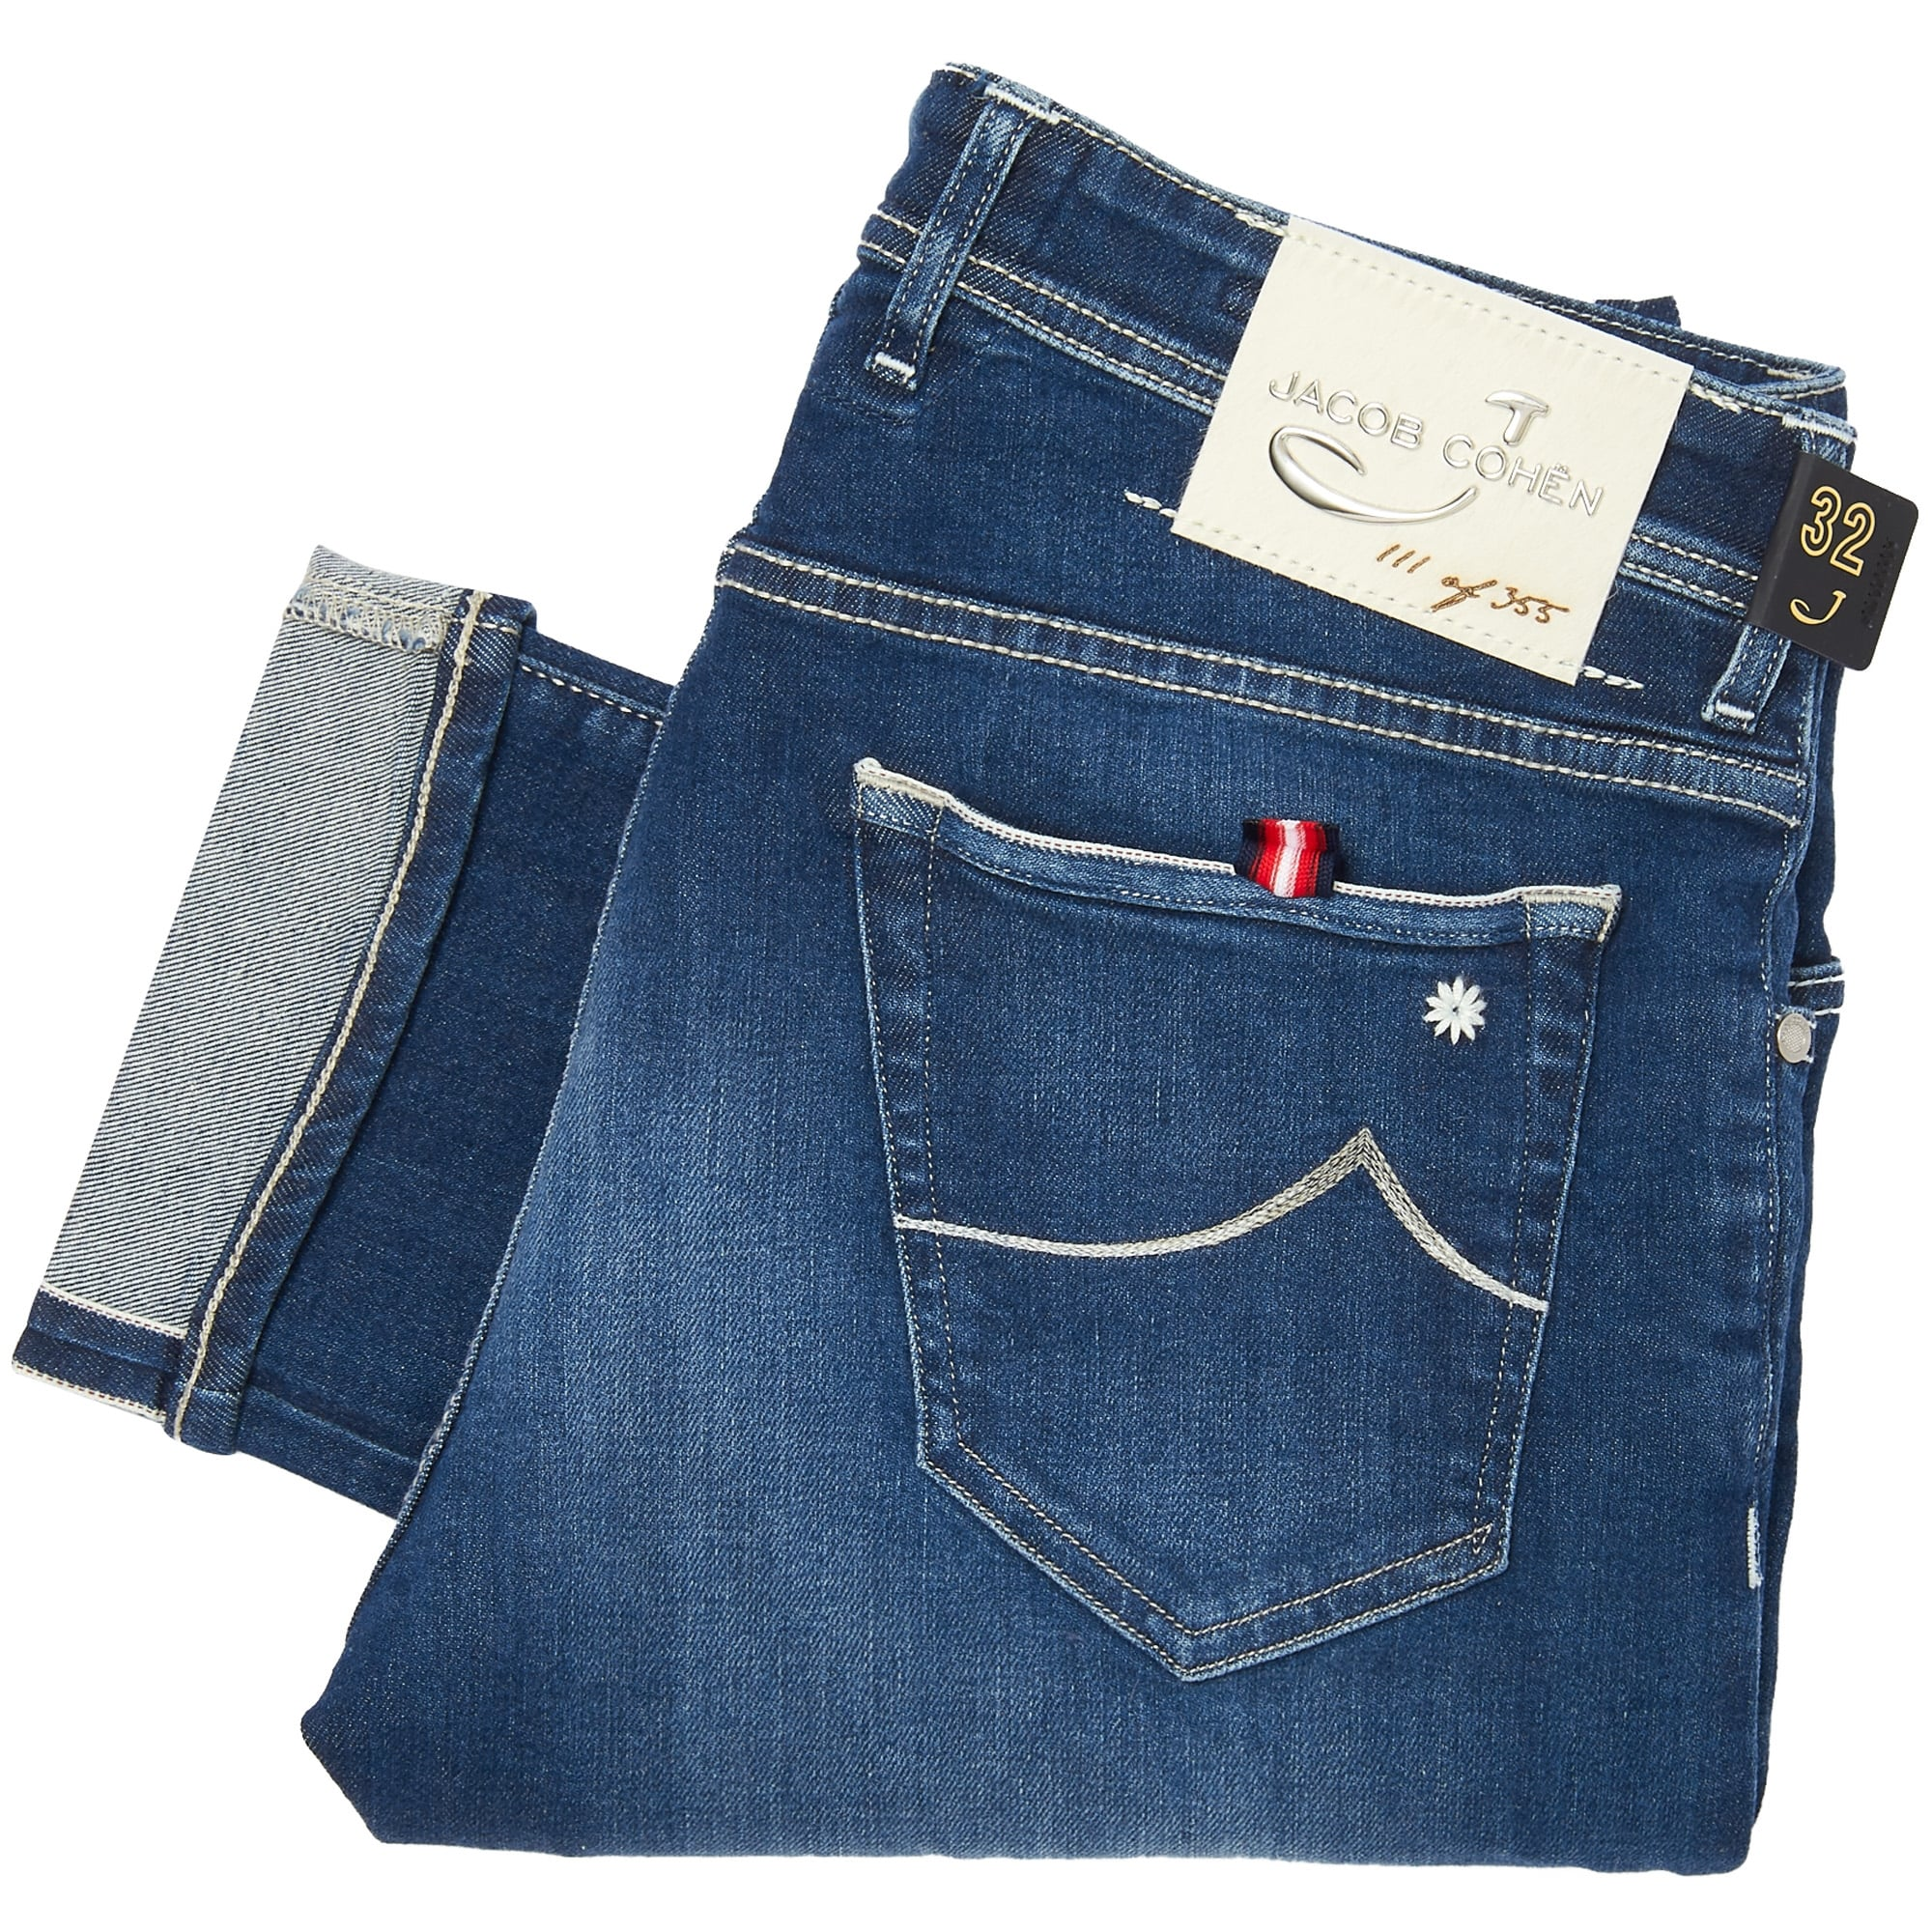 Jacob J688 US J688 Cohen Stockists Jeans Limited Edition Denim Comfort rfnT1Eqrw